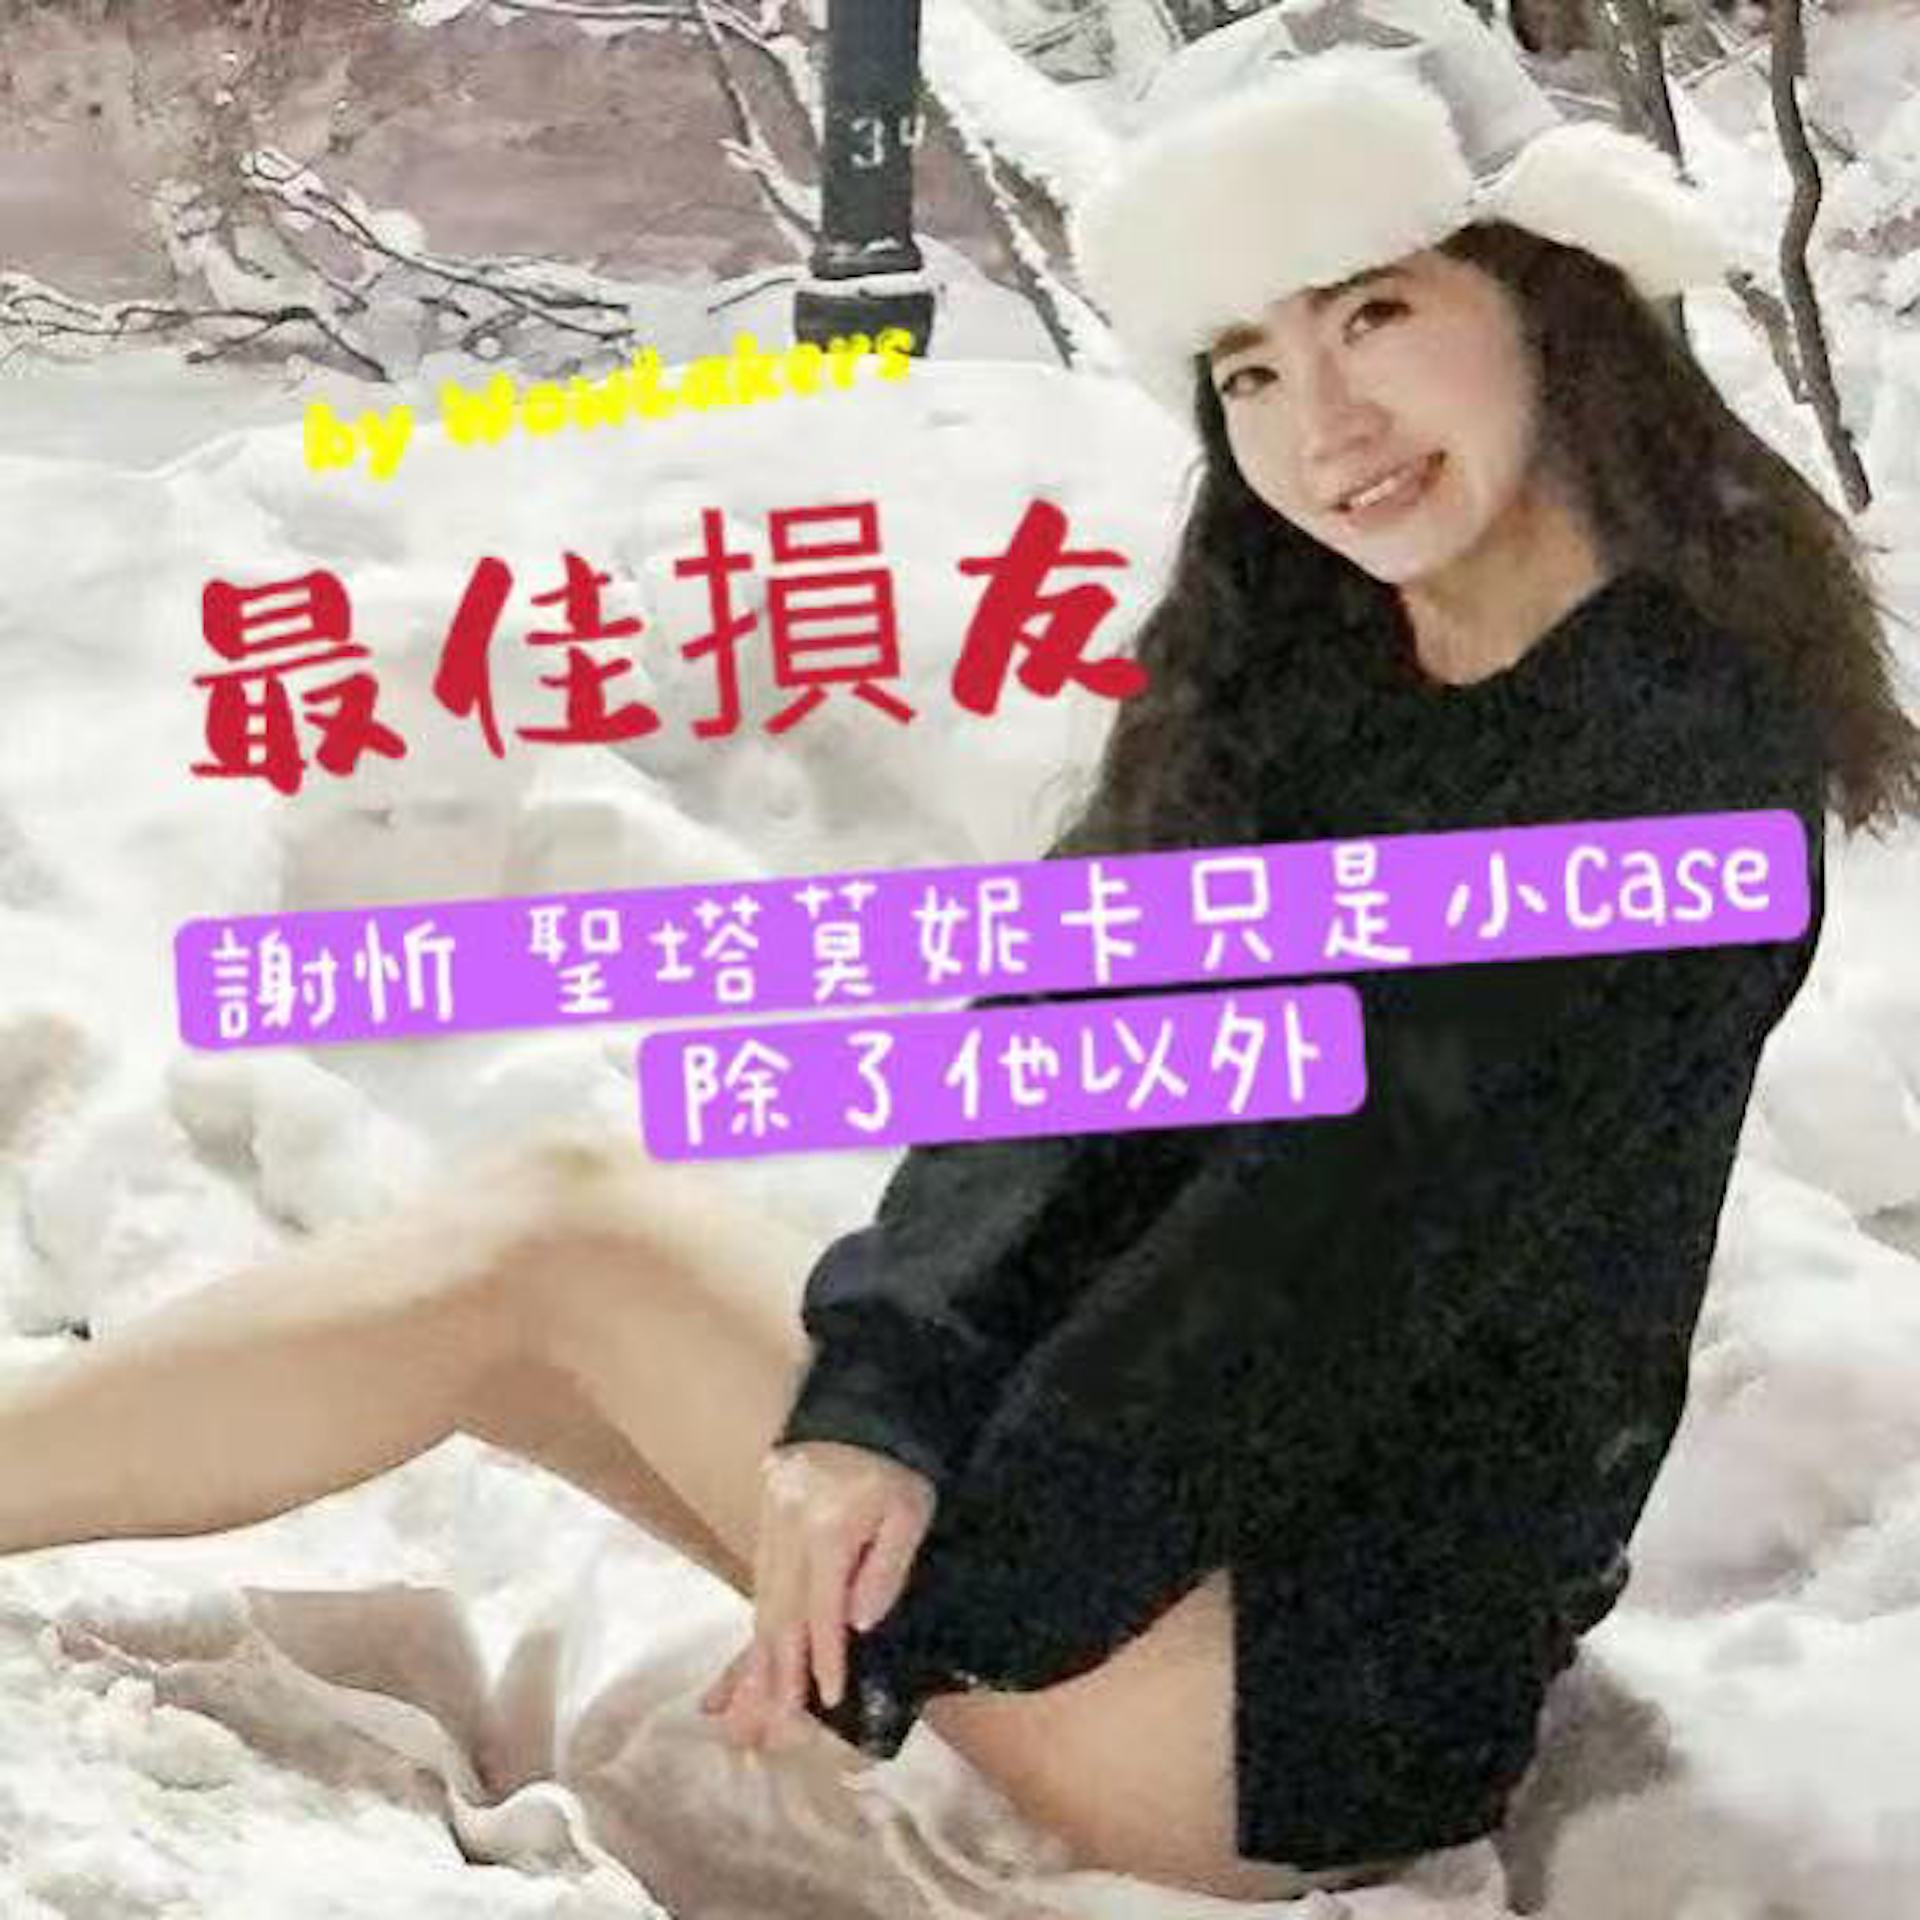 EP.12 謝忻旅遊勝地生死一瞬間,「他」一封簡訊救回 @最佳損友by WowLakers